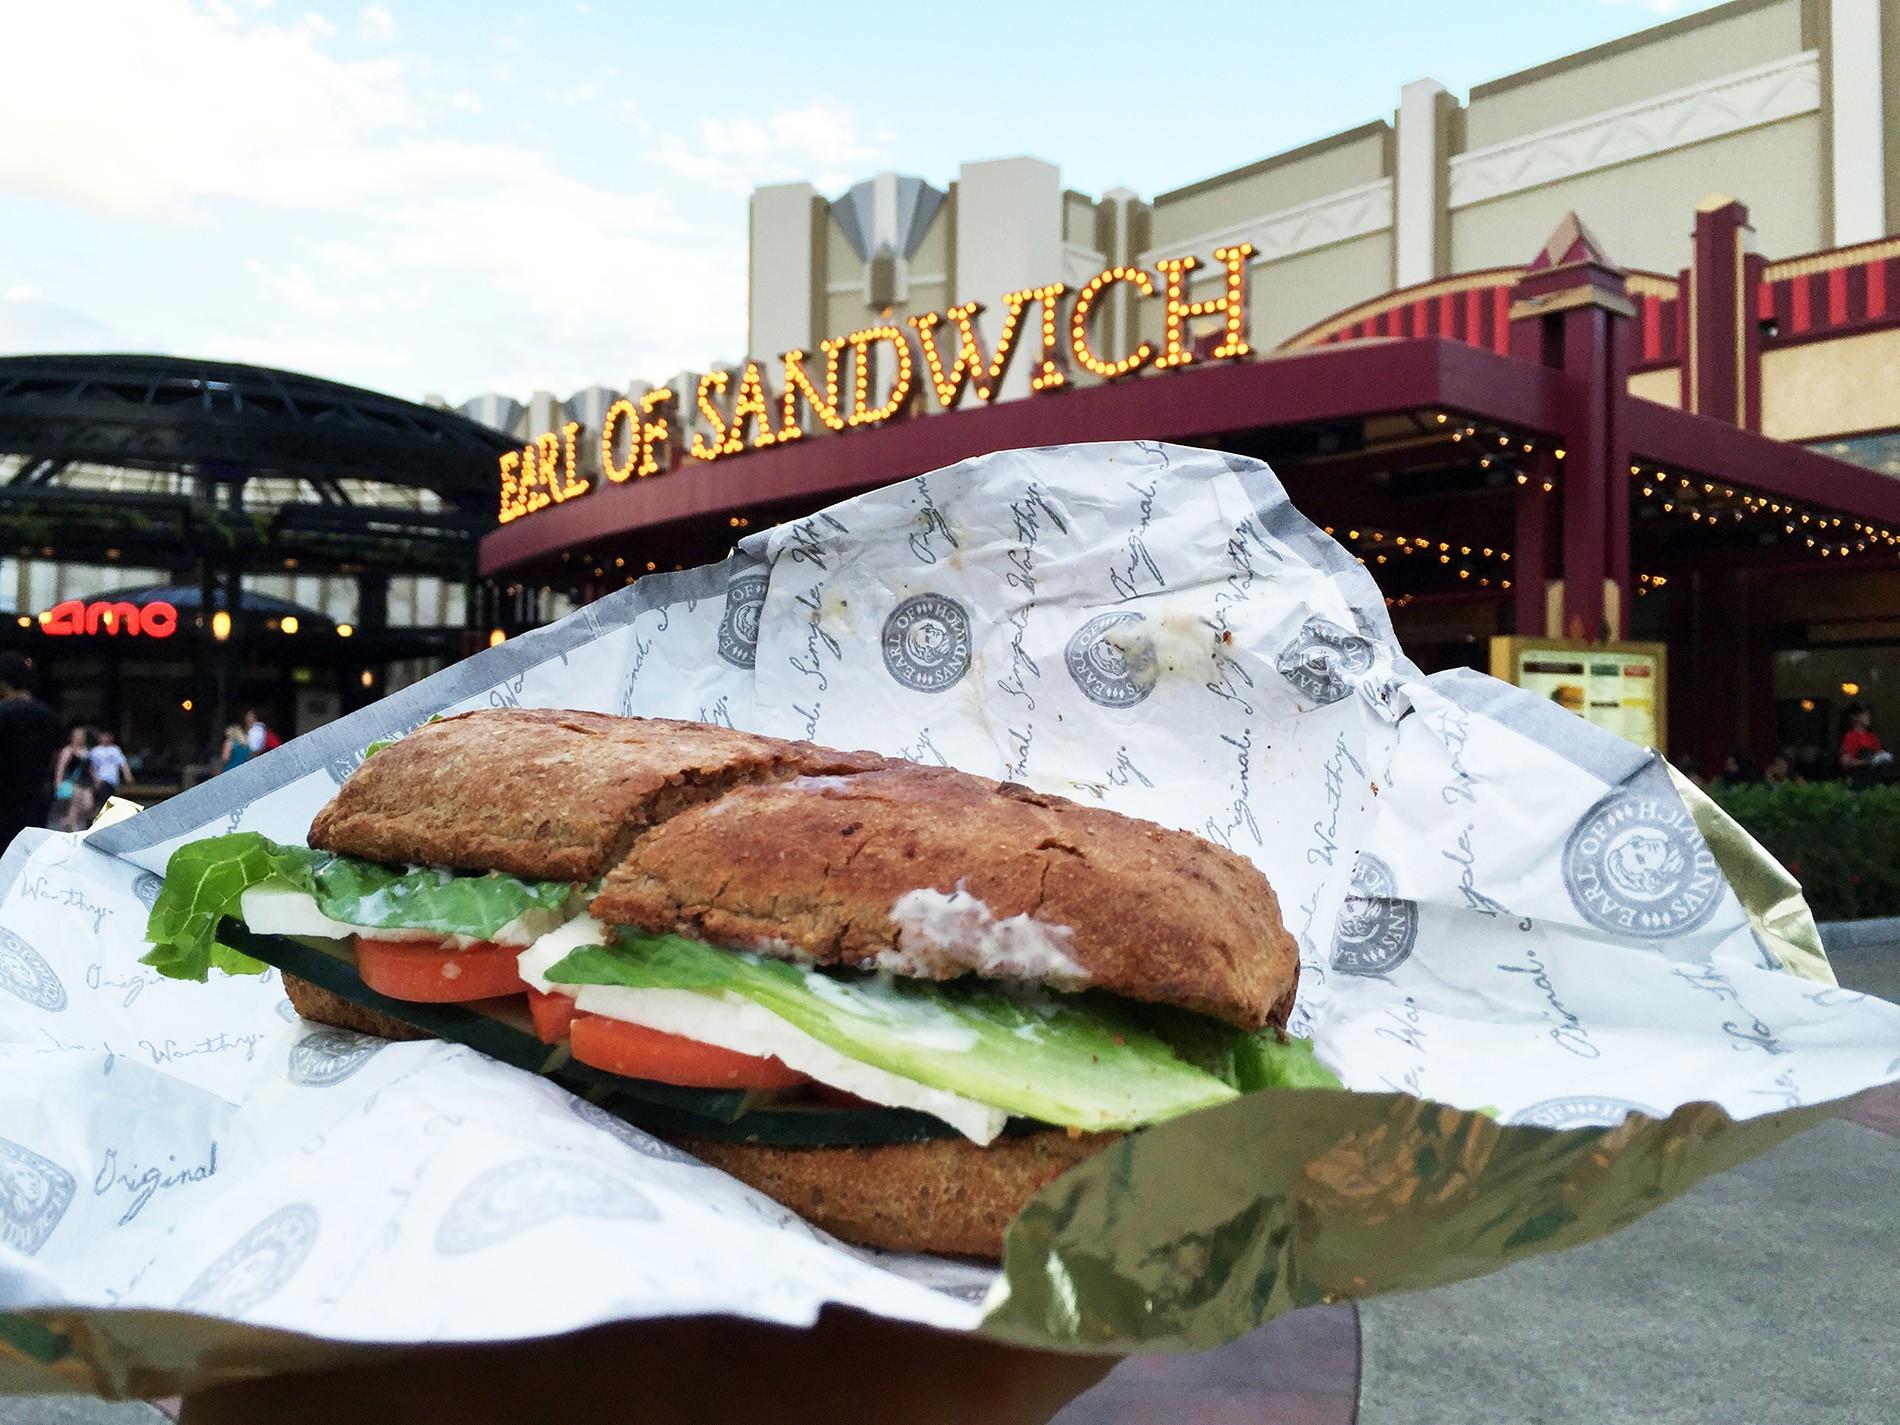 Free veggie sandwich